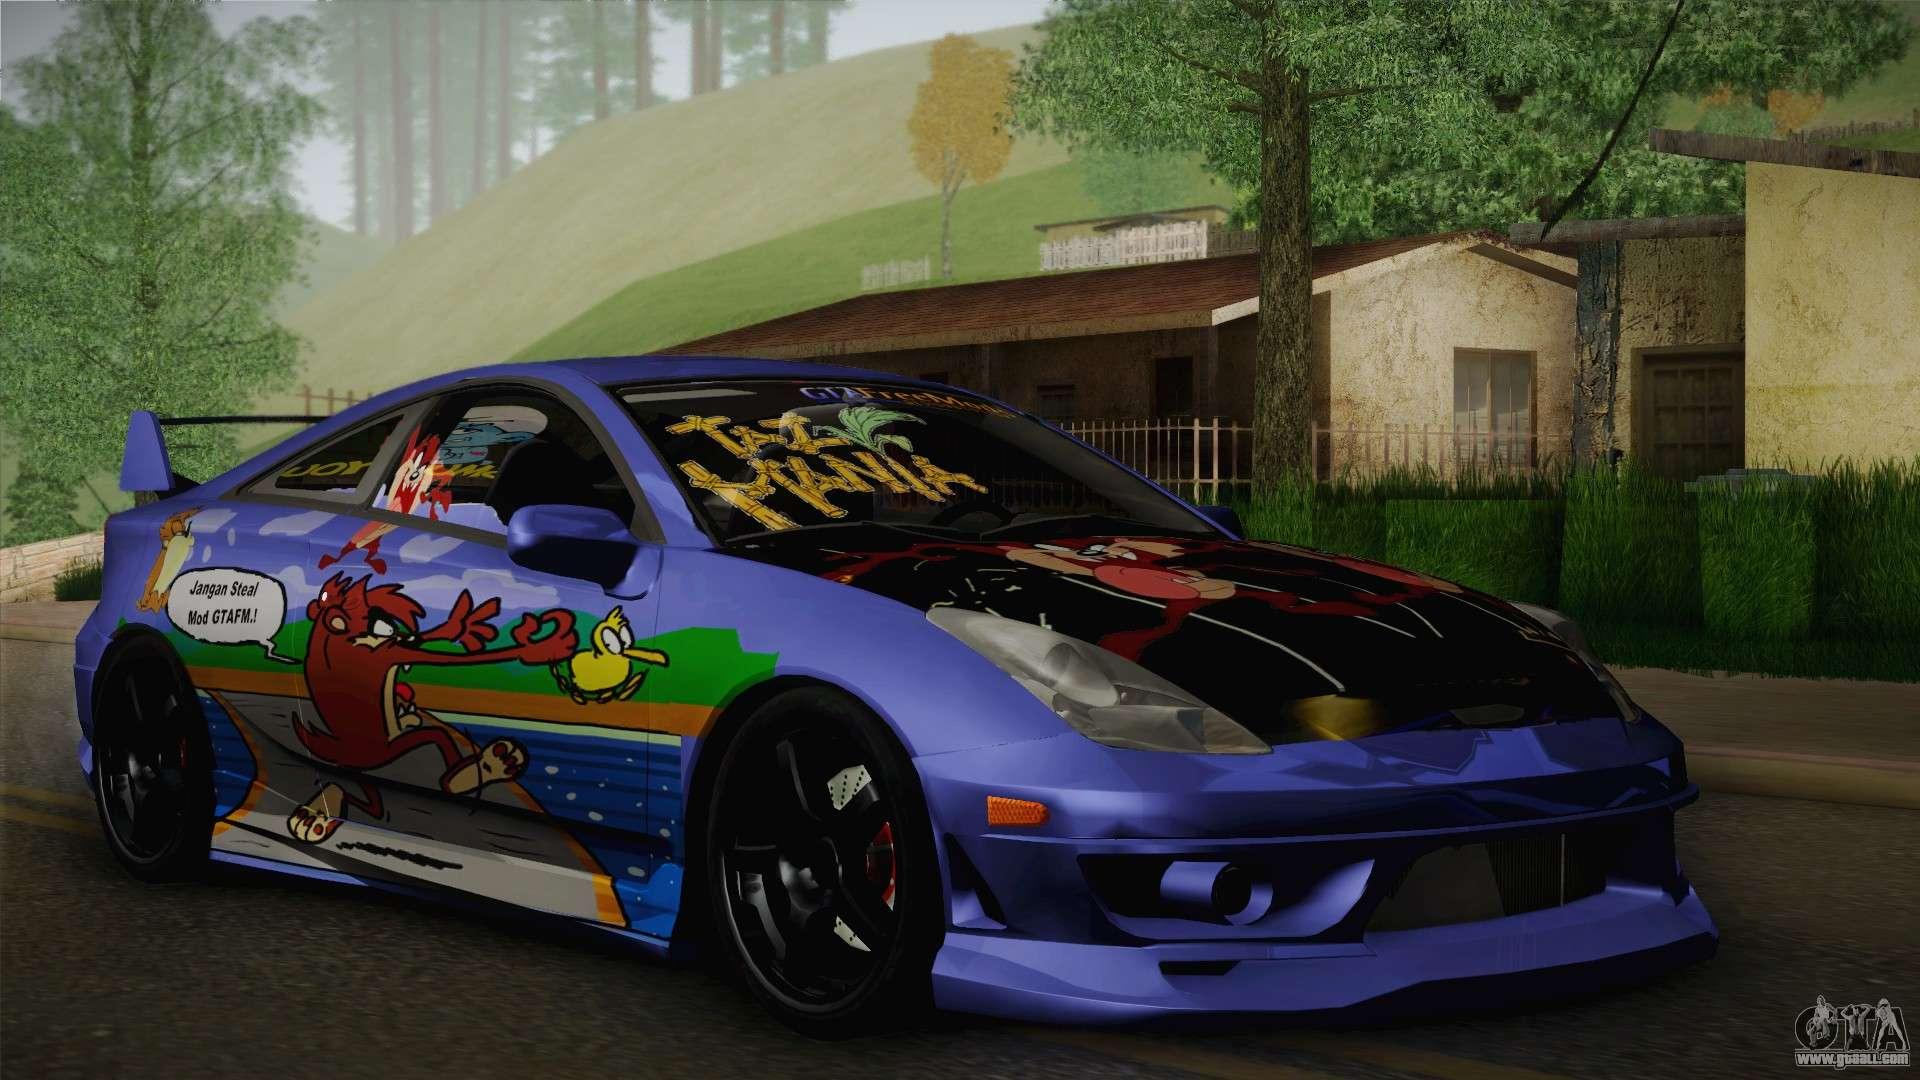 Toyota Celica Taz Mania Street Edition for GTA San Andreas